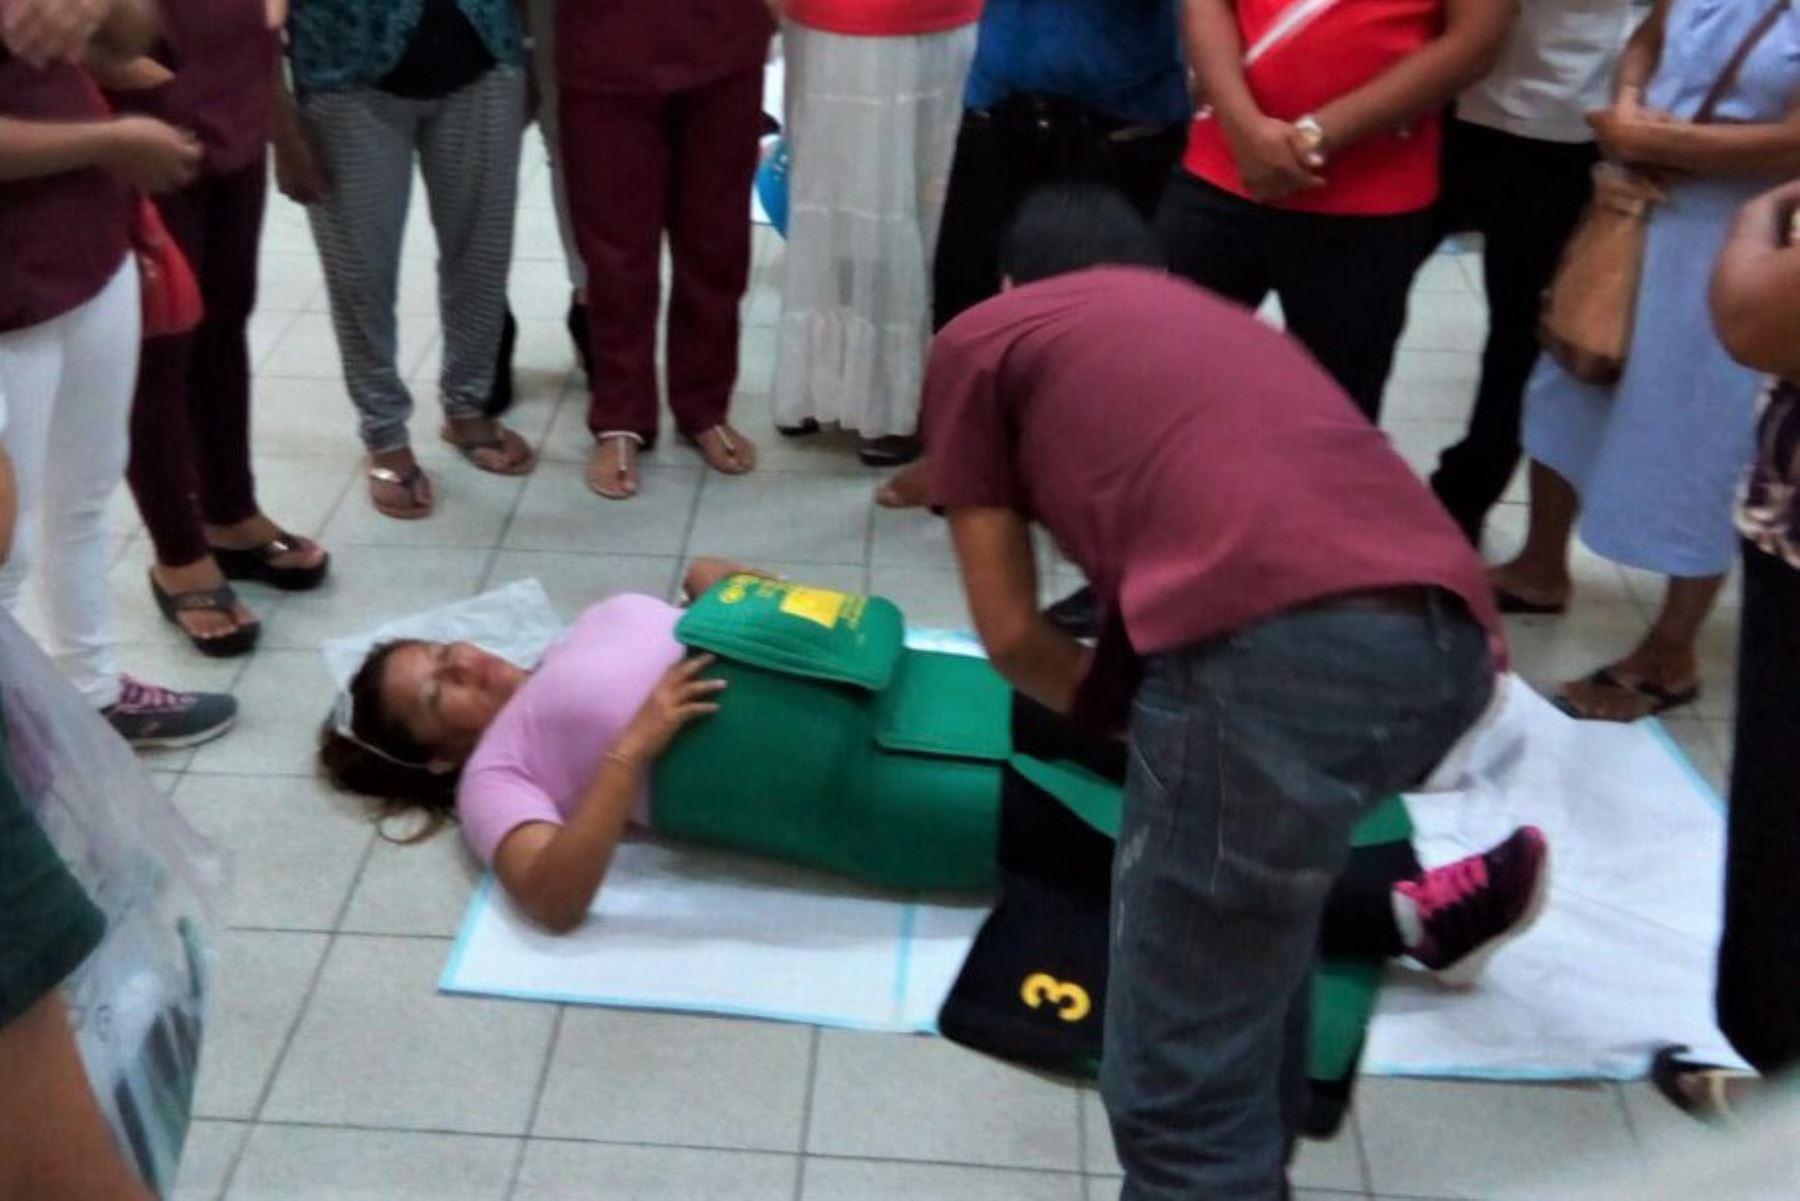 Minsa capacita a mujeres indígenas de Loreto en técnicas para reducir muertes maternas en sus comunidades. ANDINA/Difusión